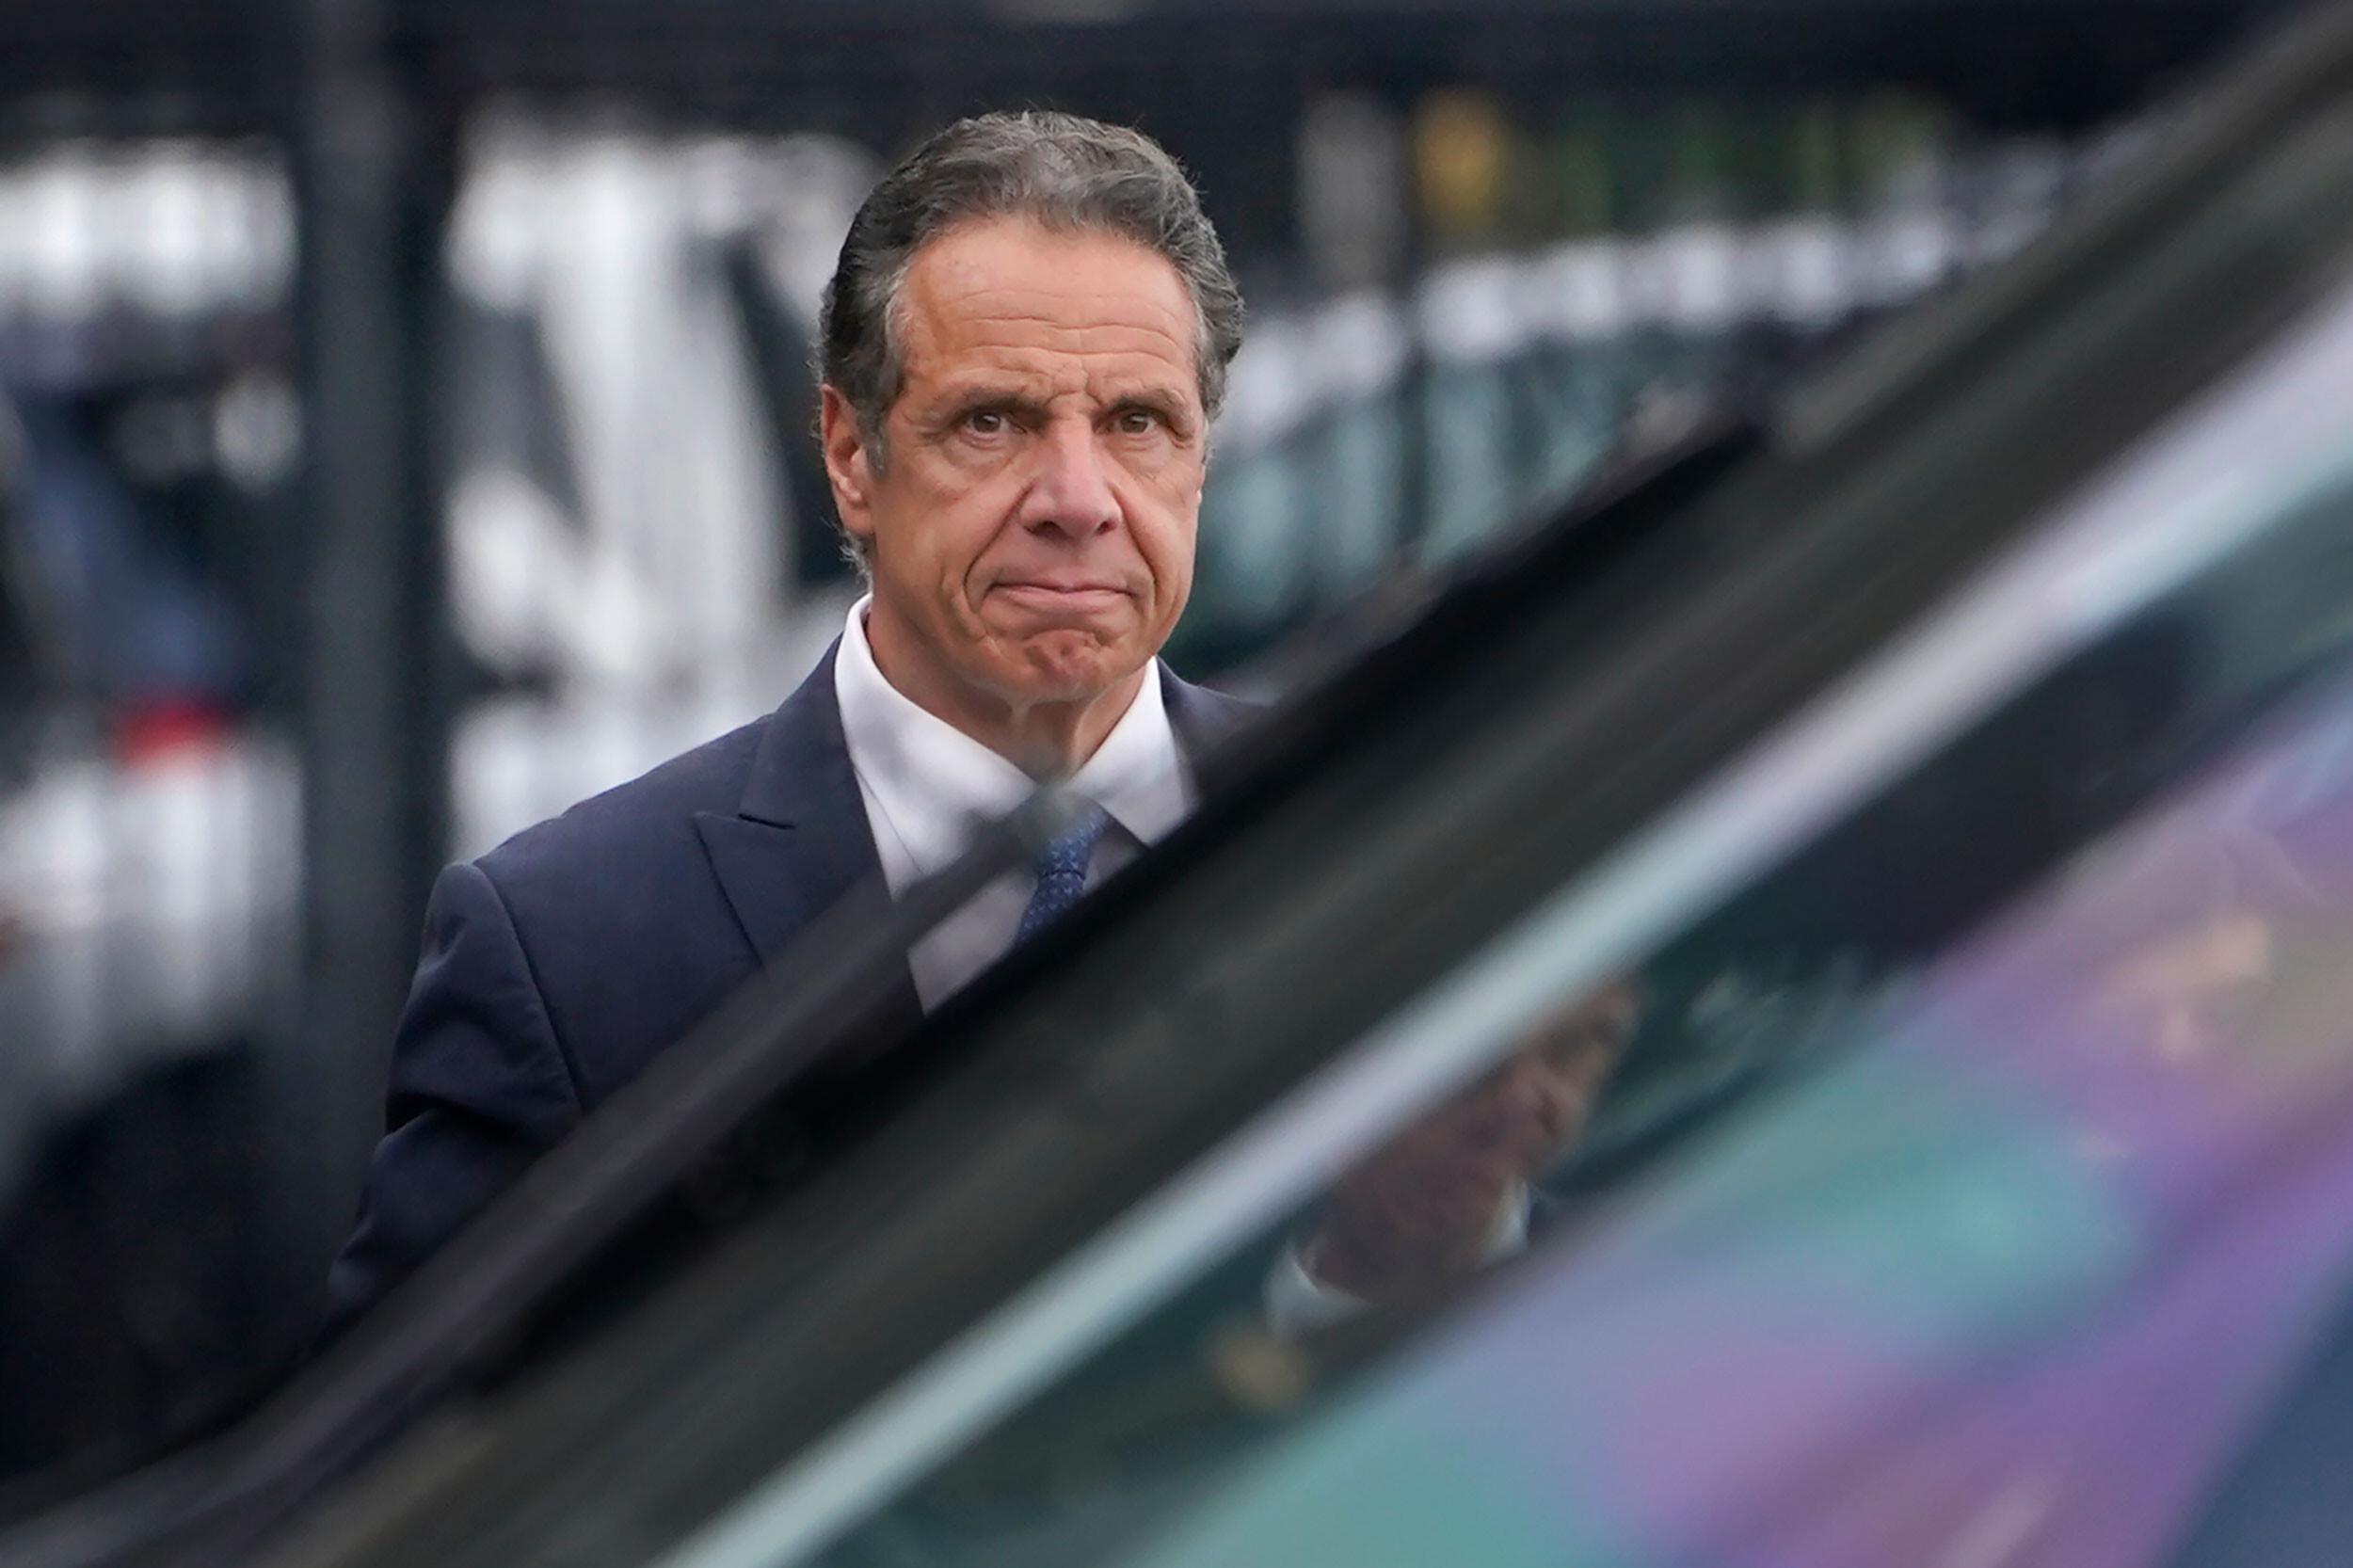 New York lawmakers suspend Cuomo impeachment investigation